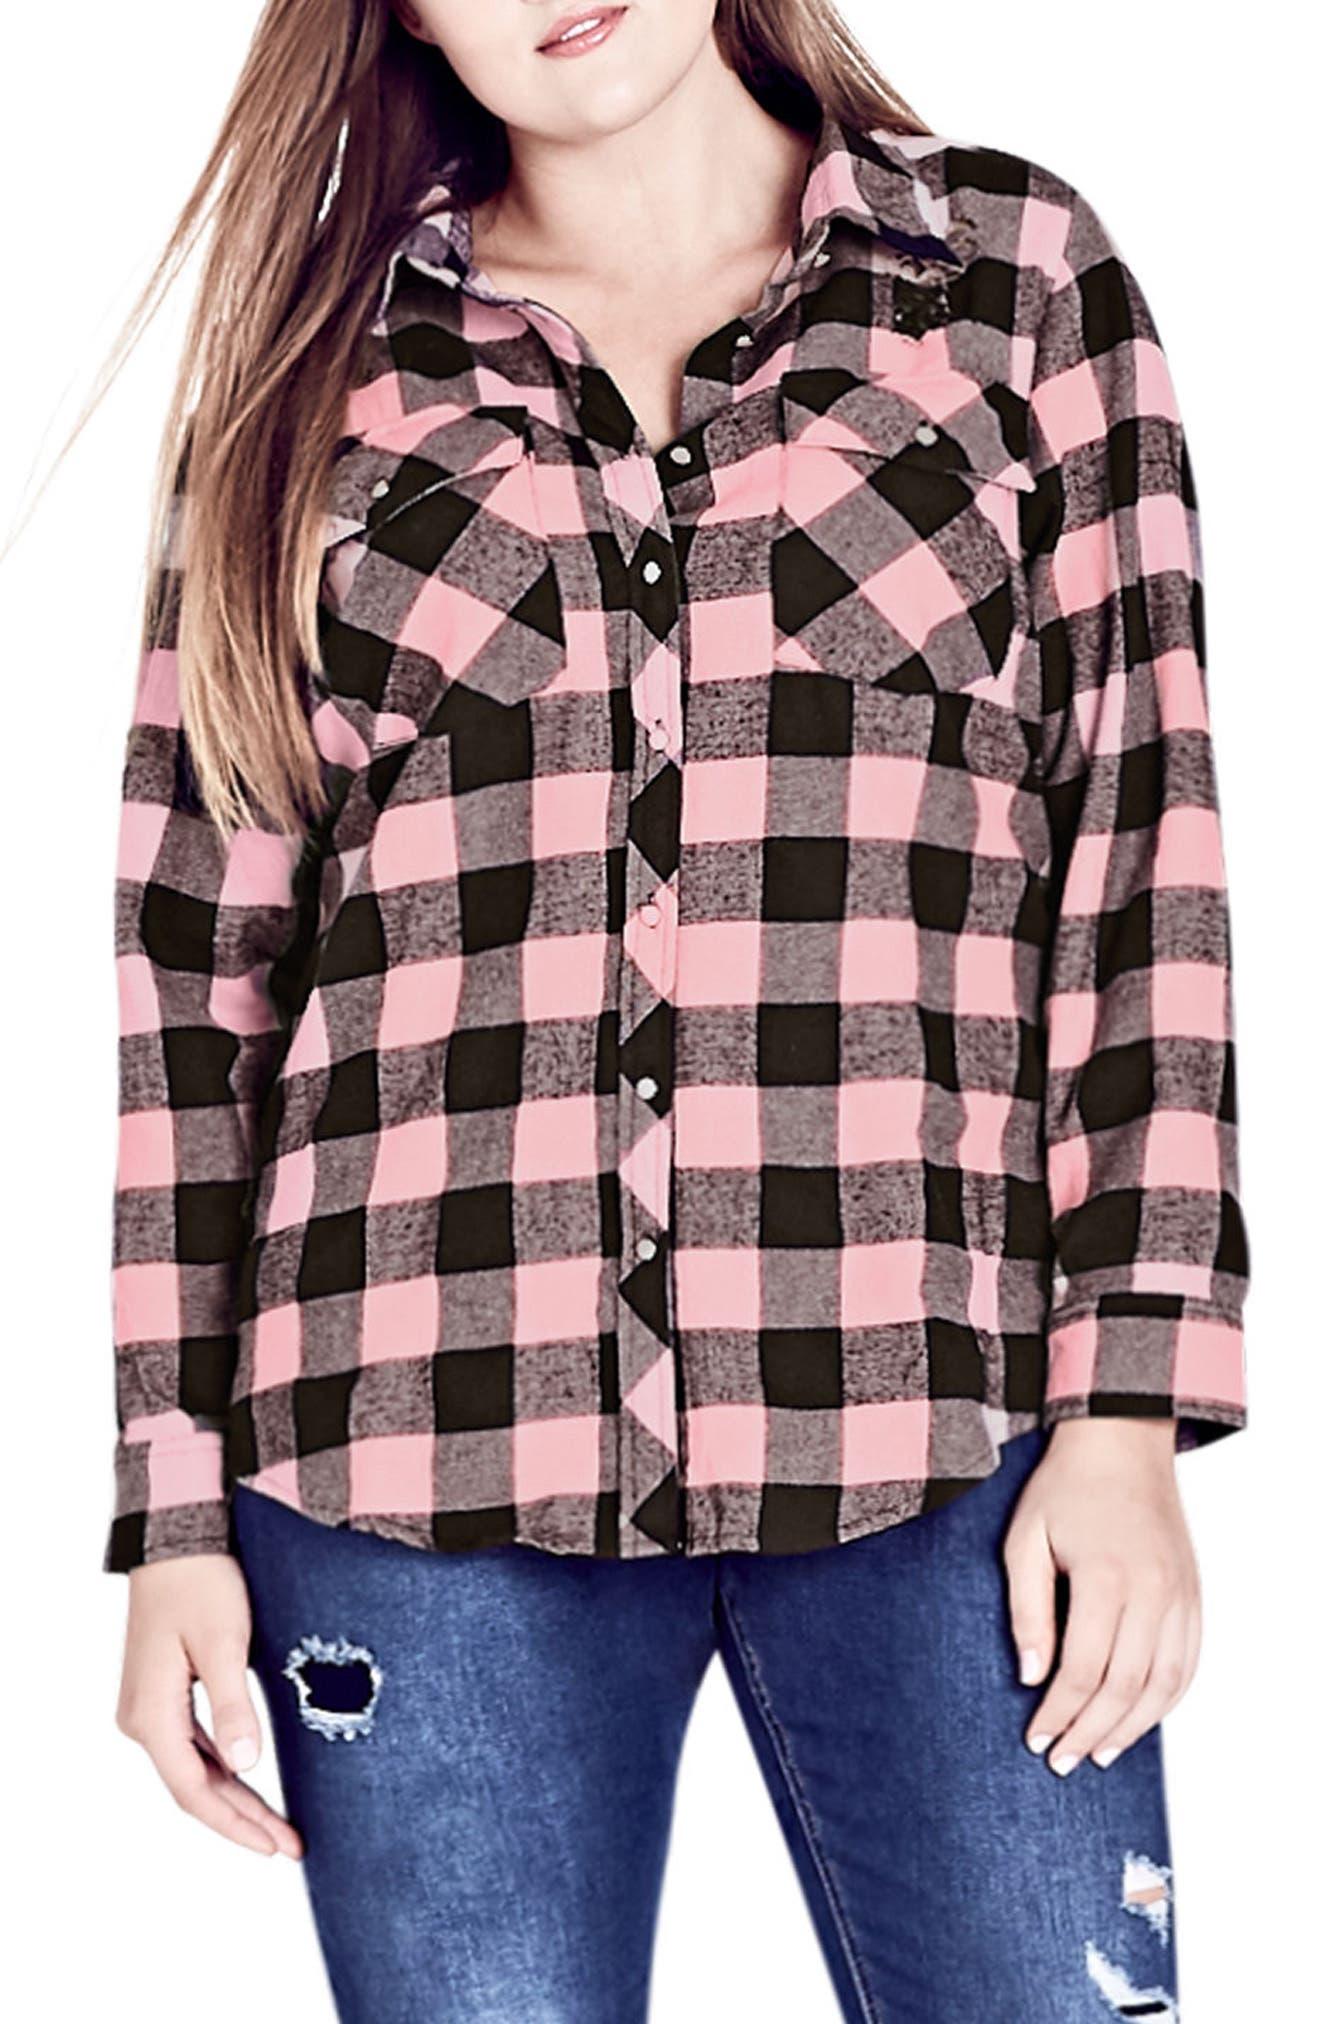 Dusty Duke Cotton Shirt,                             Main thumbnail 1, color,                             656